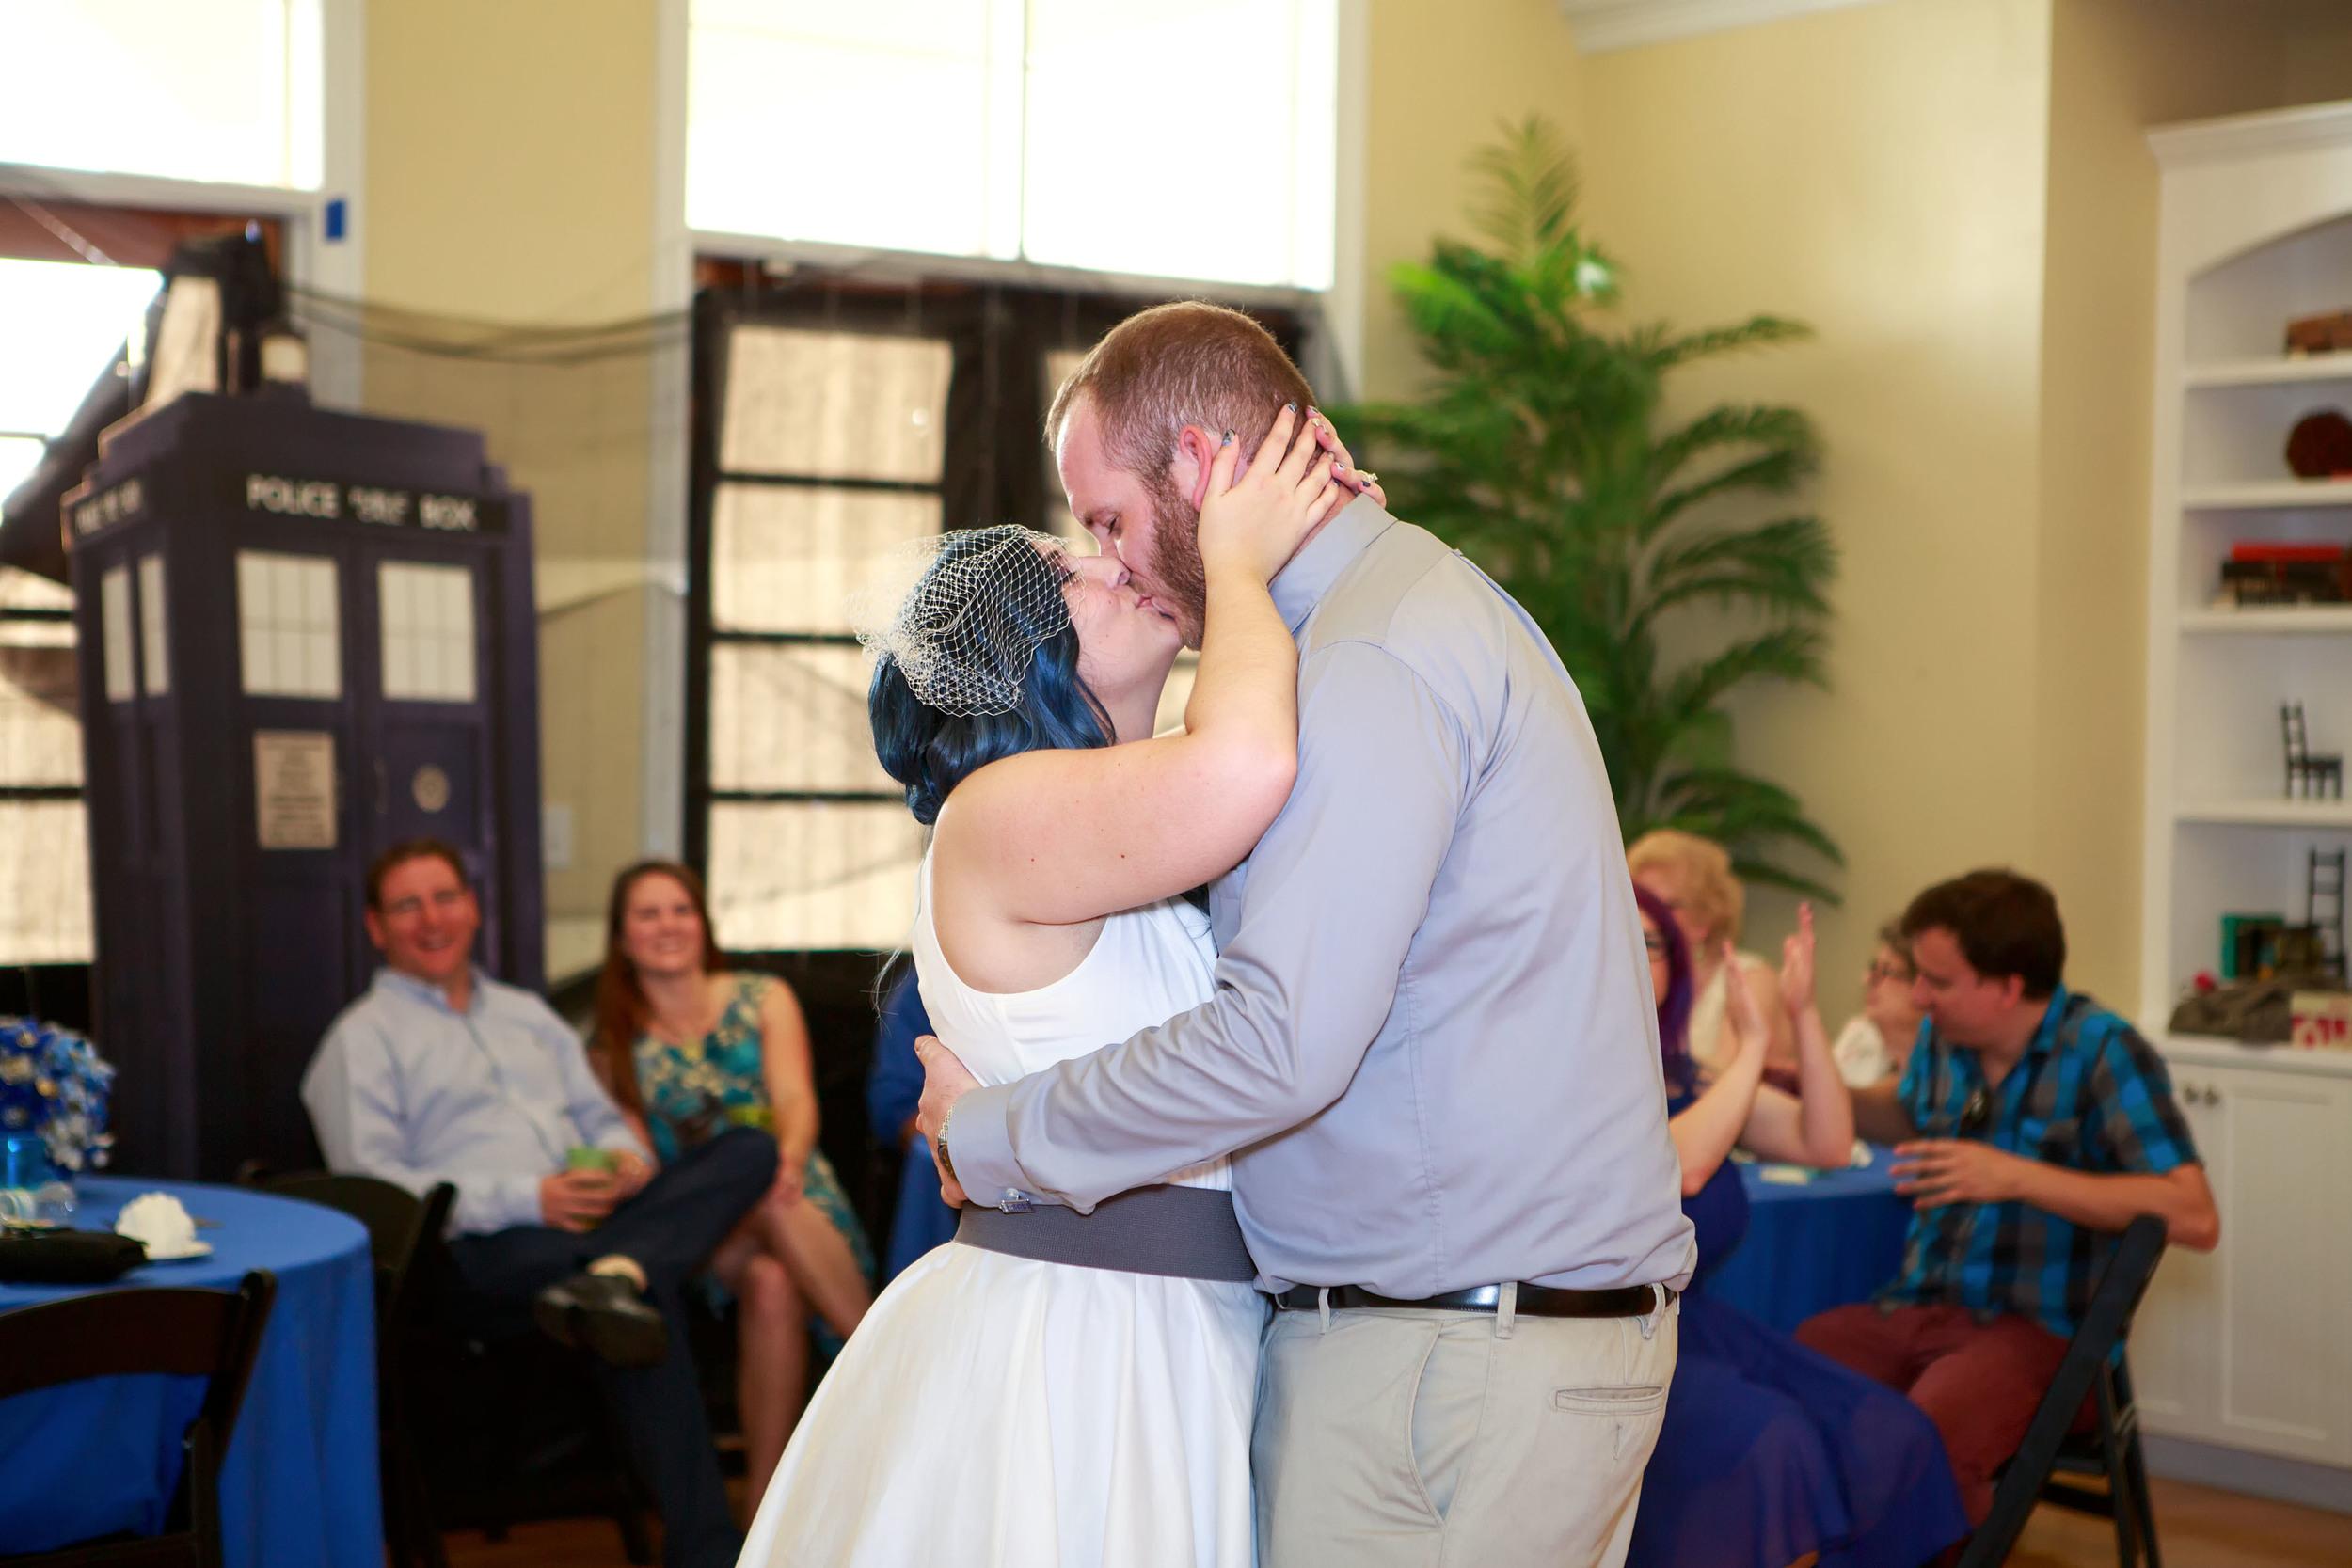 Leland_Wedding_Photographer_Tiffany_Abruzzo_Reception_90.jpg